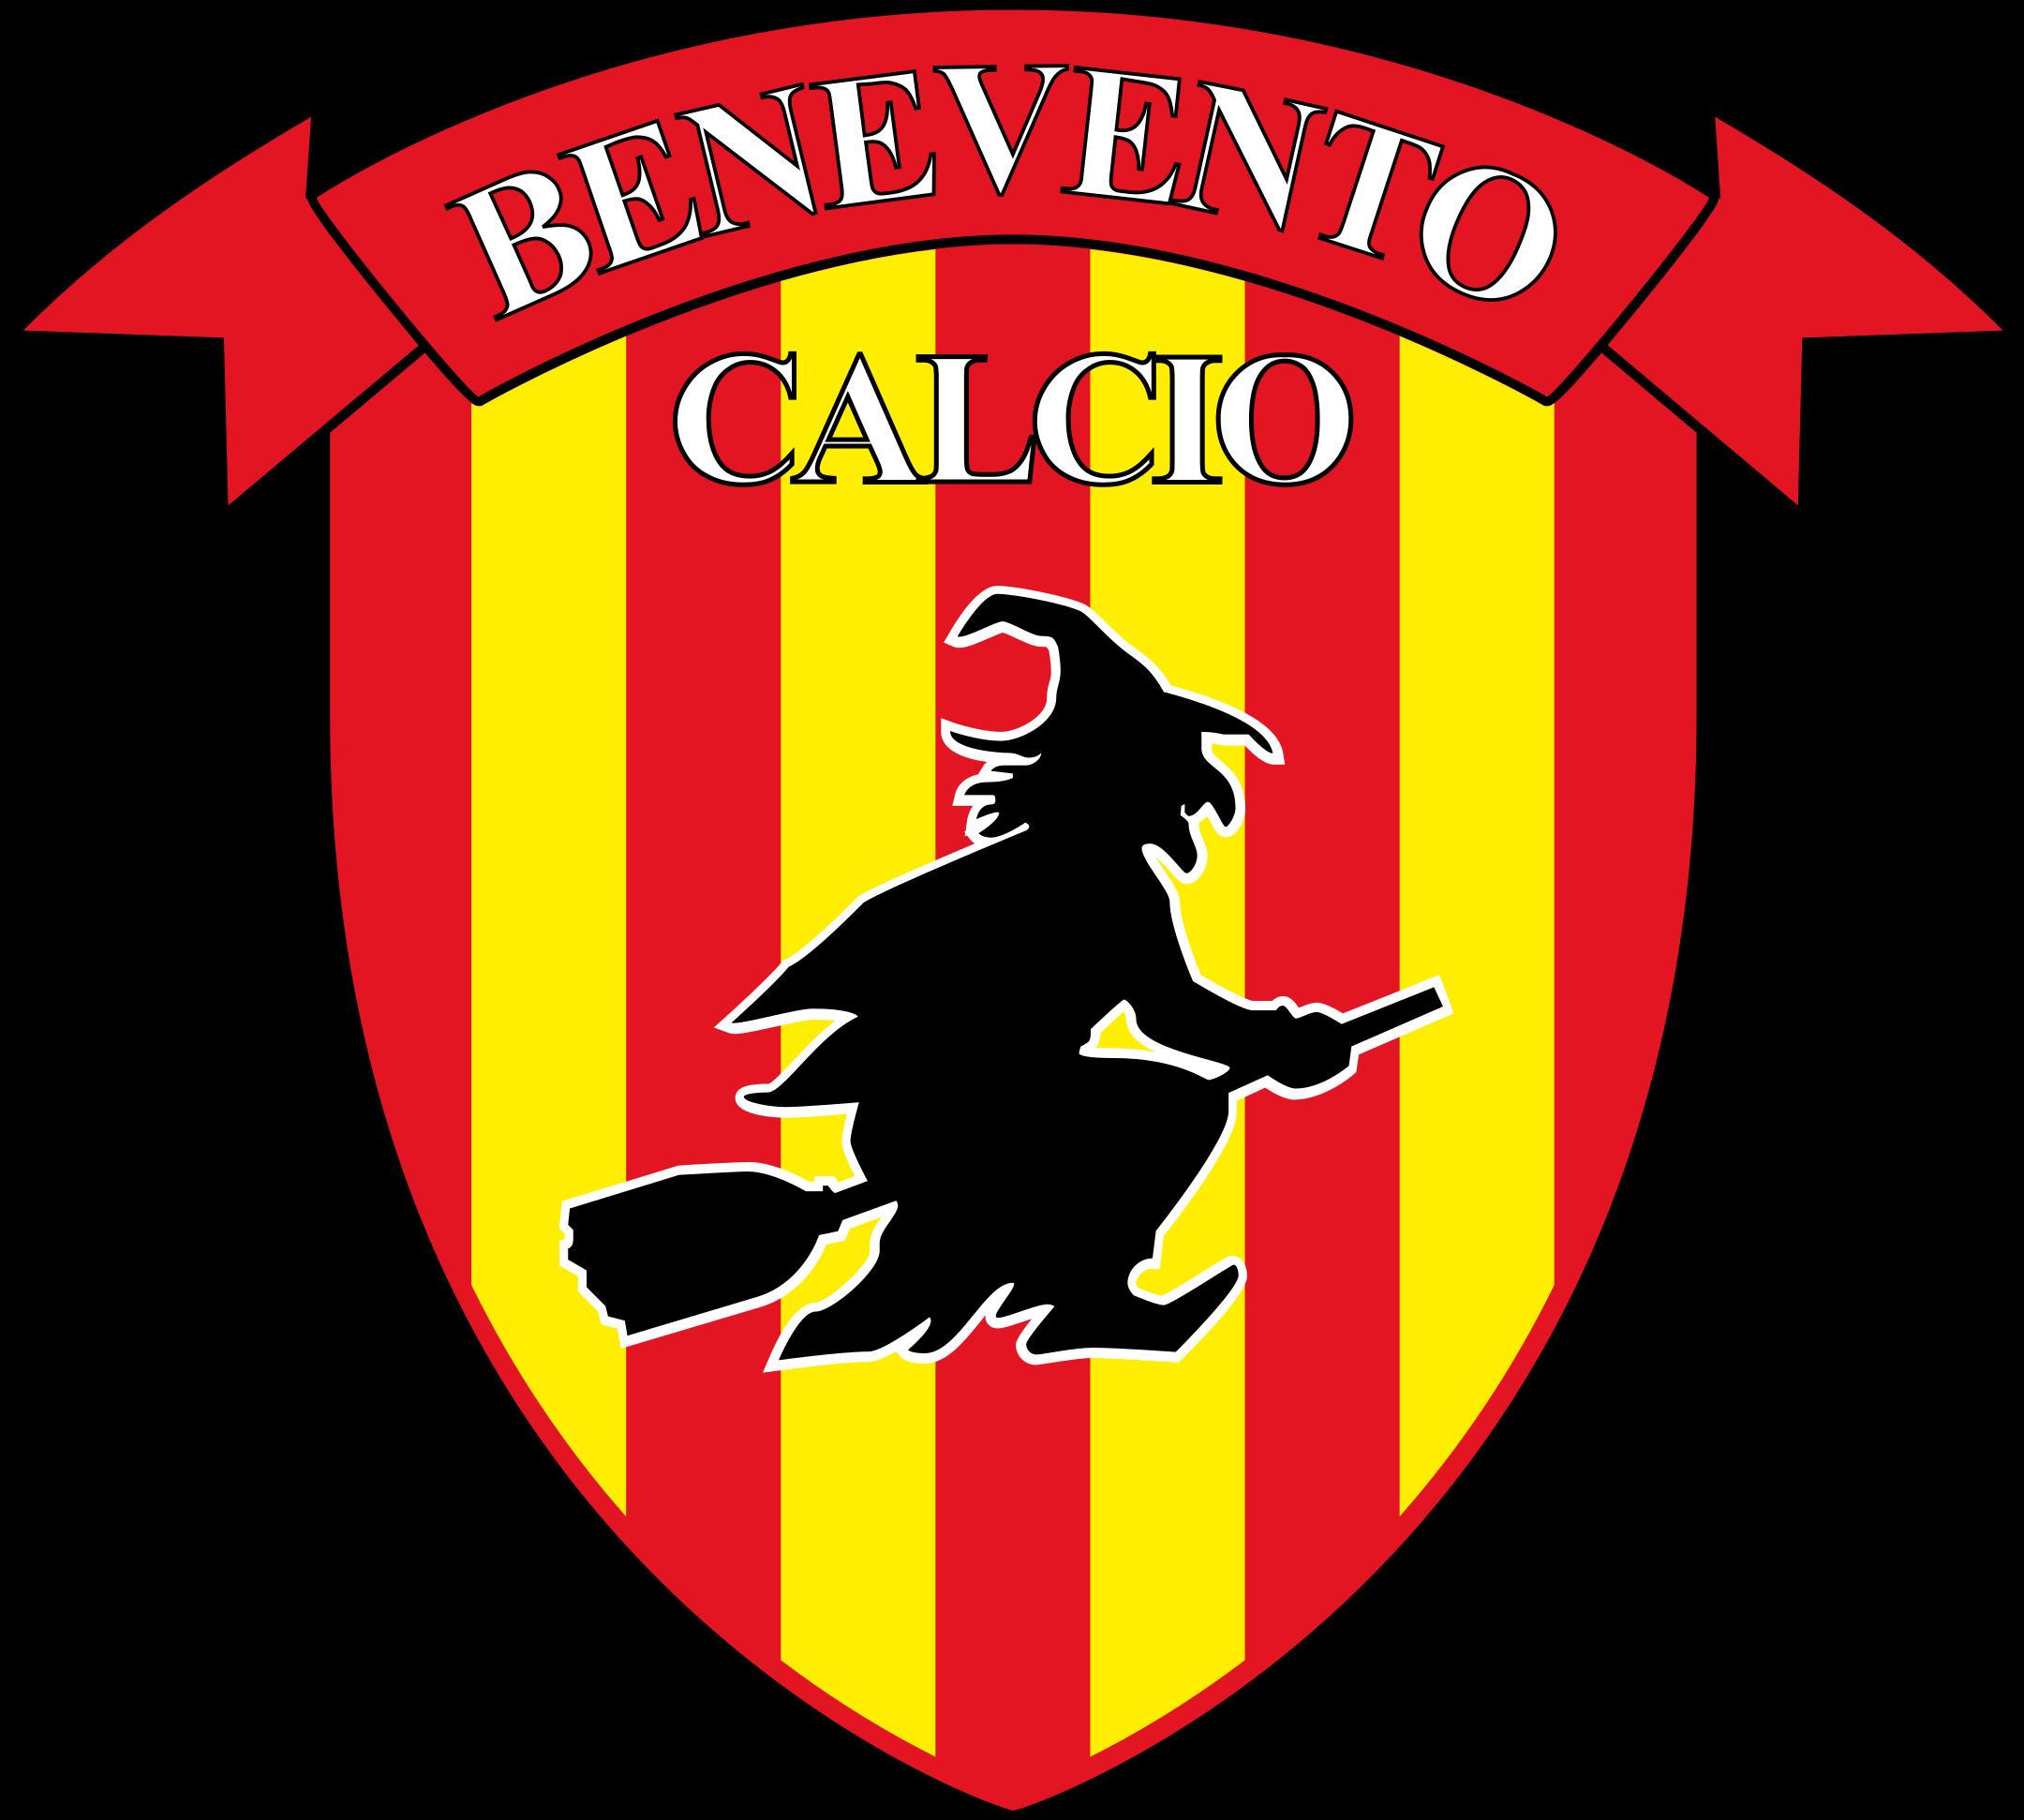 benevento calcio logo 1 - Benevento Calcio Logo